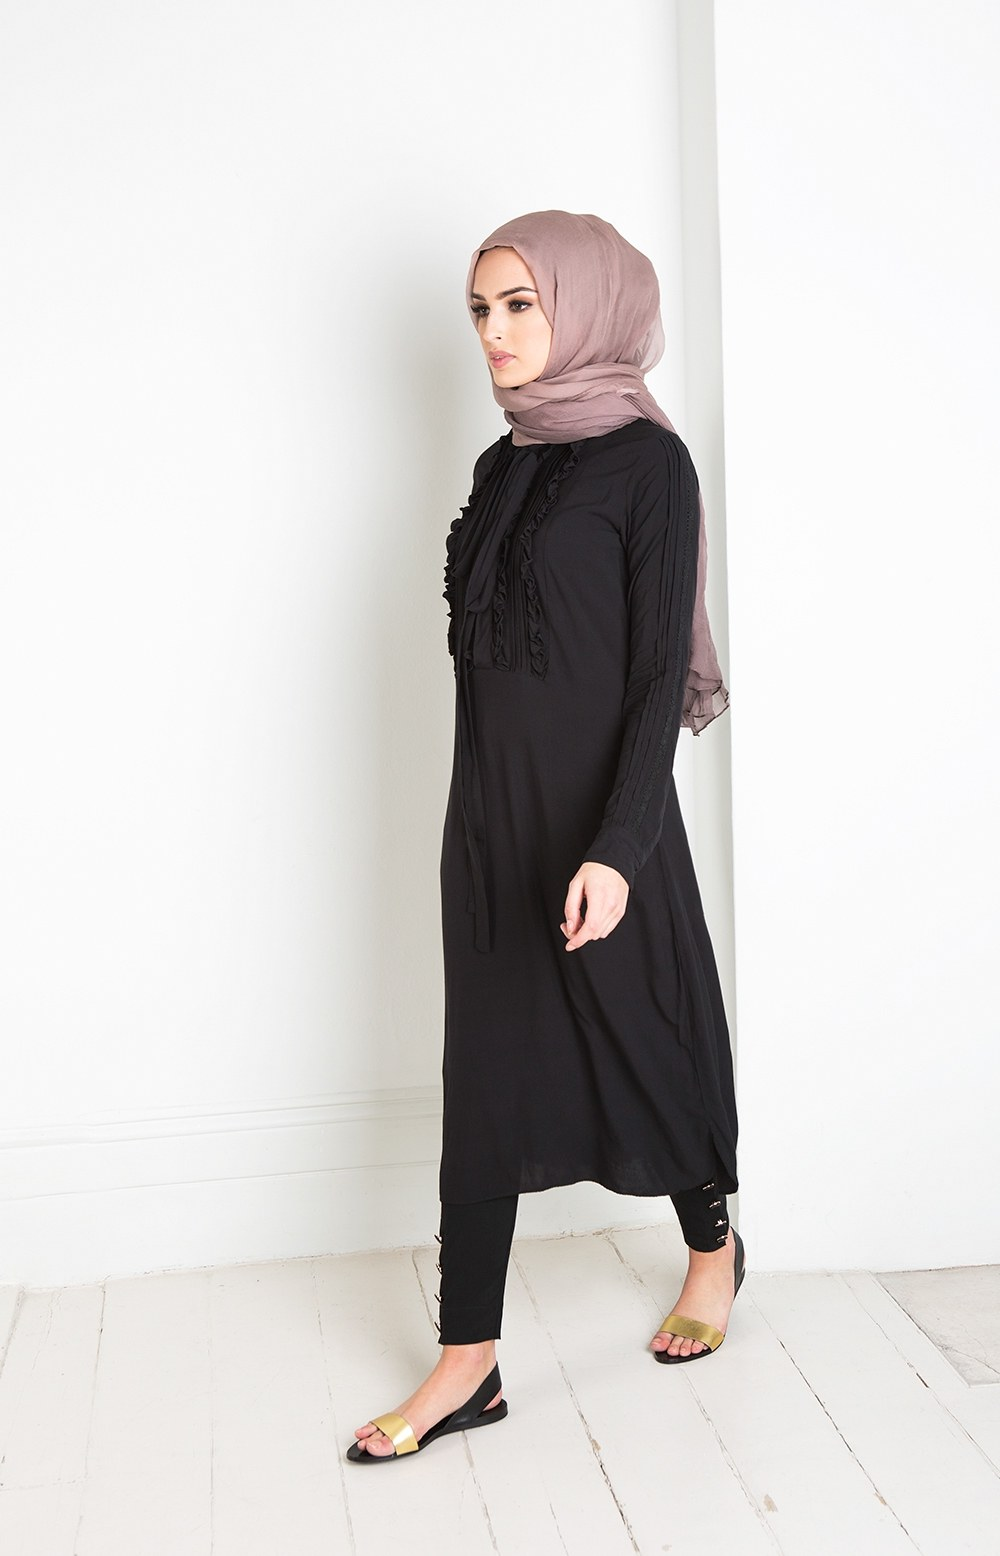 Bentuk Model Baju Lebaran Wanita Mndw 25 Trend Model Baju Muslim Lebaran 2018 Simple & Modis